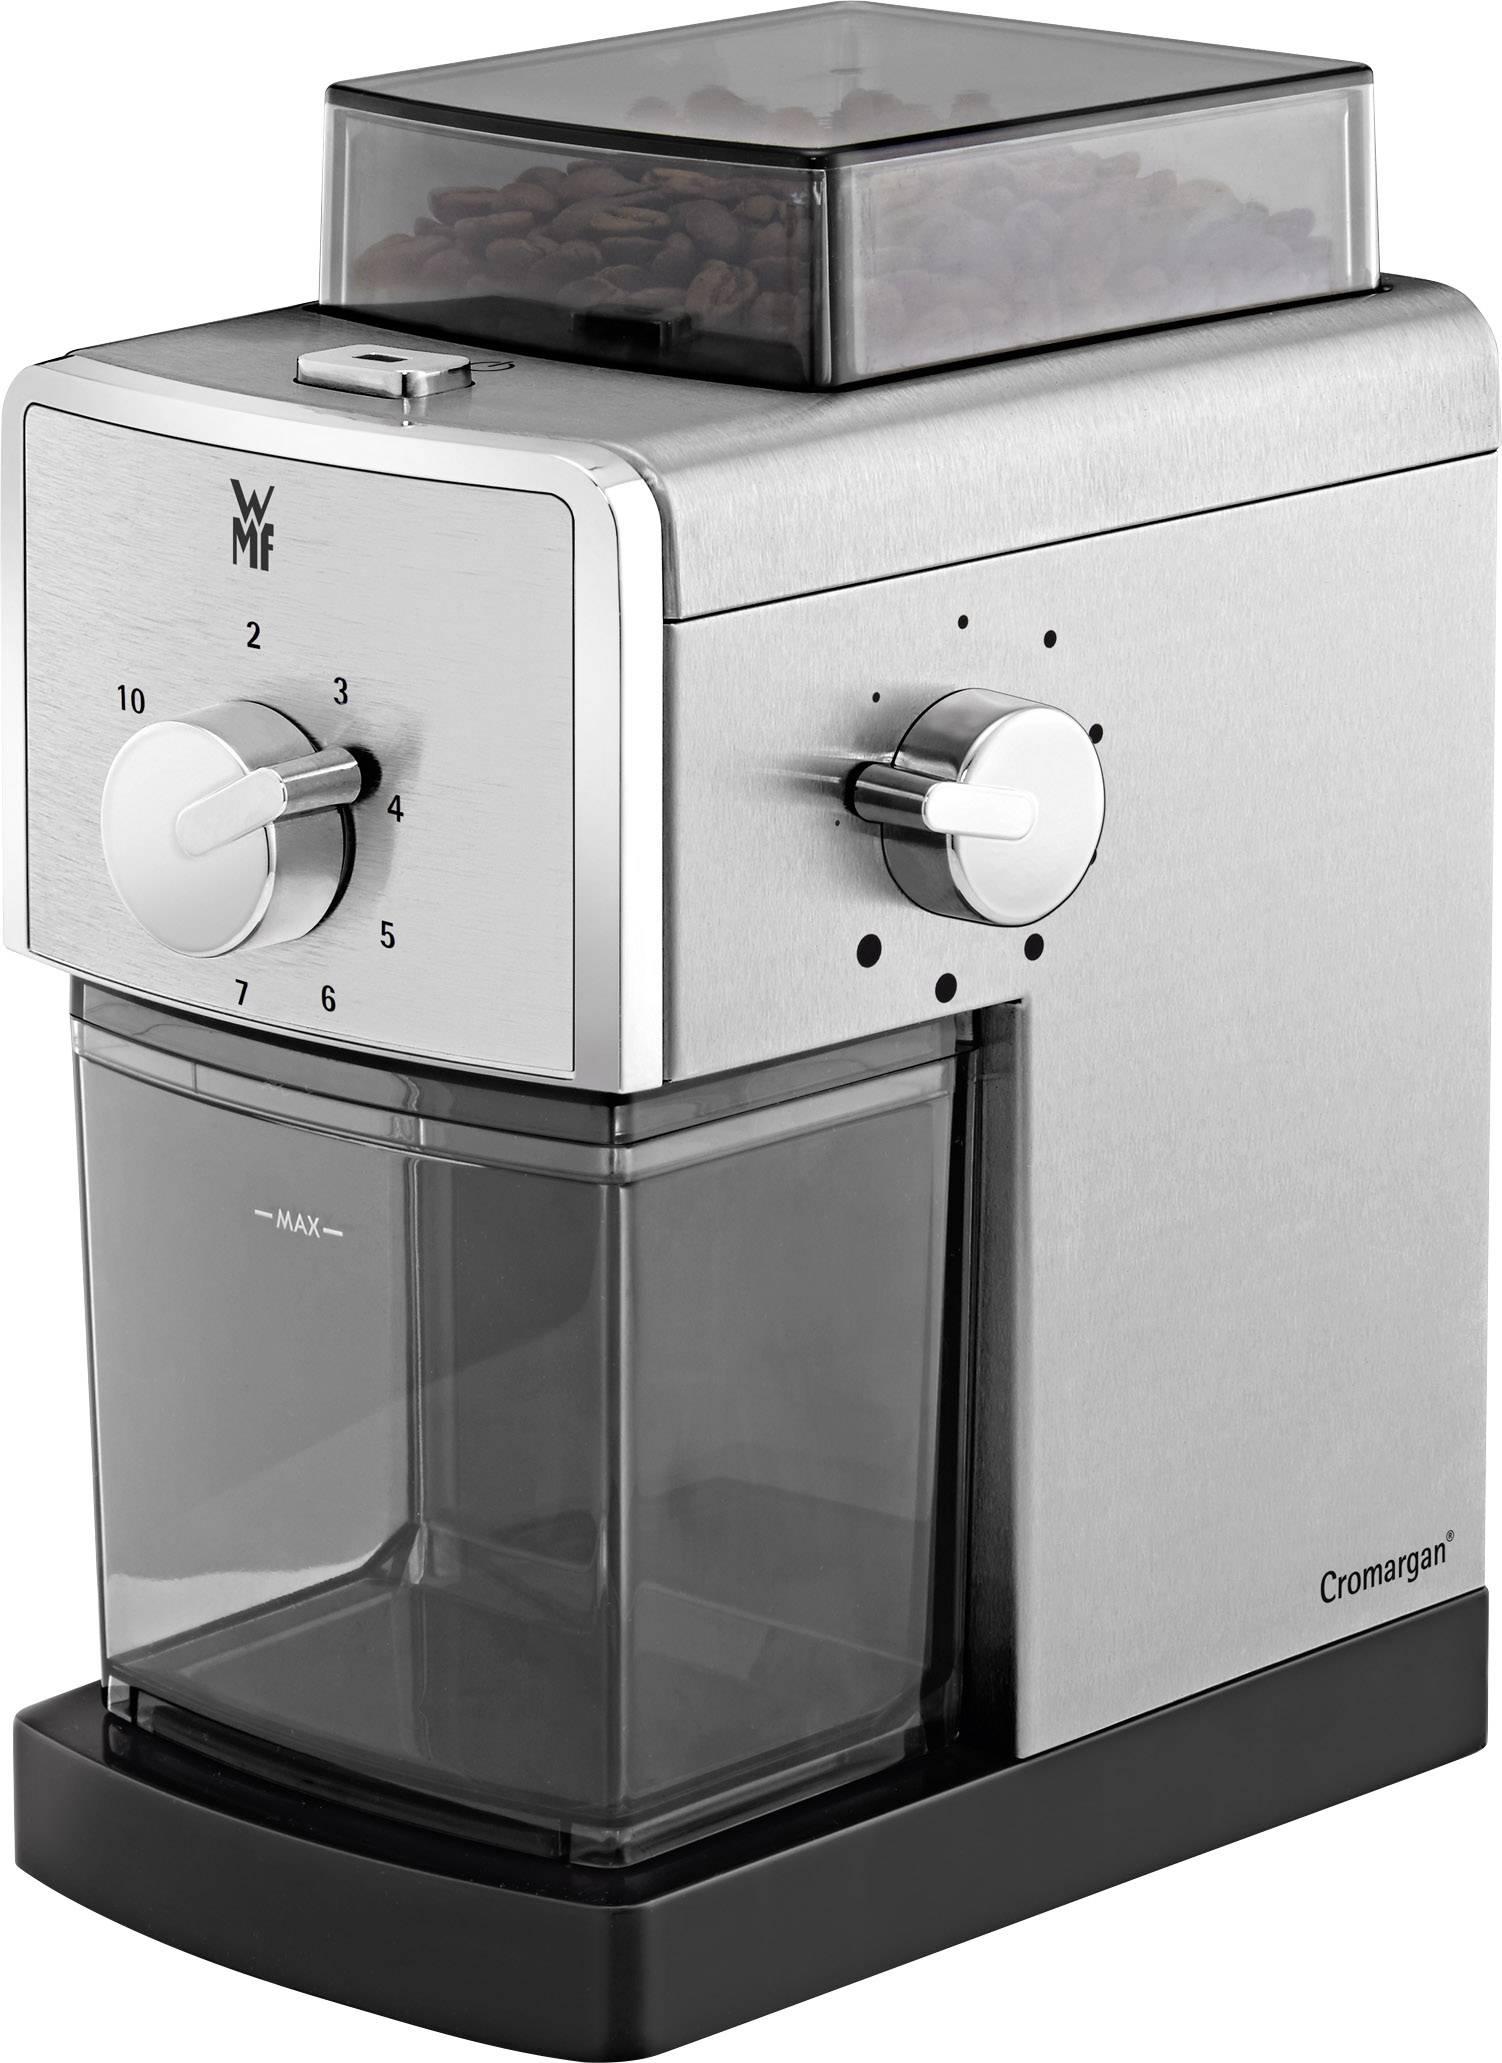 WMF Stelio Edition 0417070011 mlinček za kavo srebrna, črna nerjaveči mlinček s ploščatim rezilom